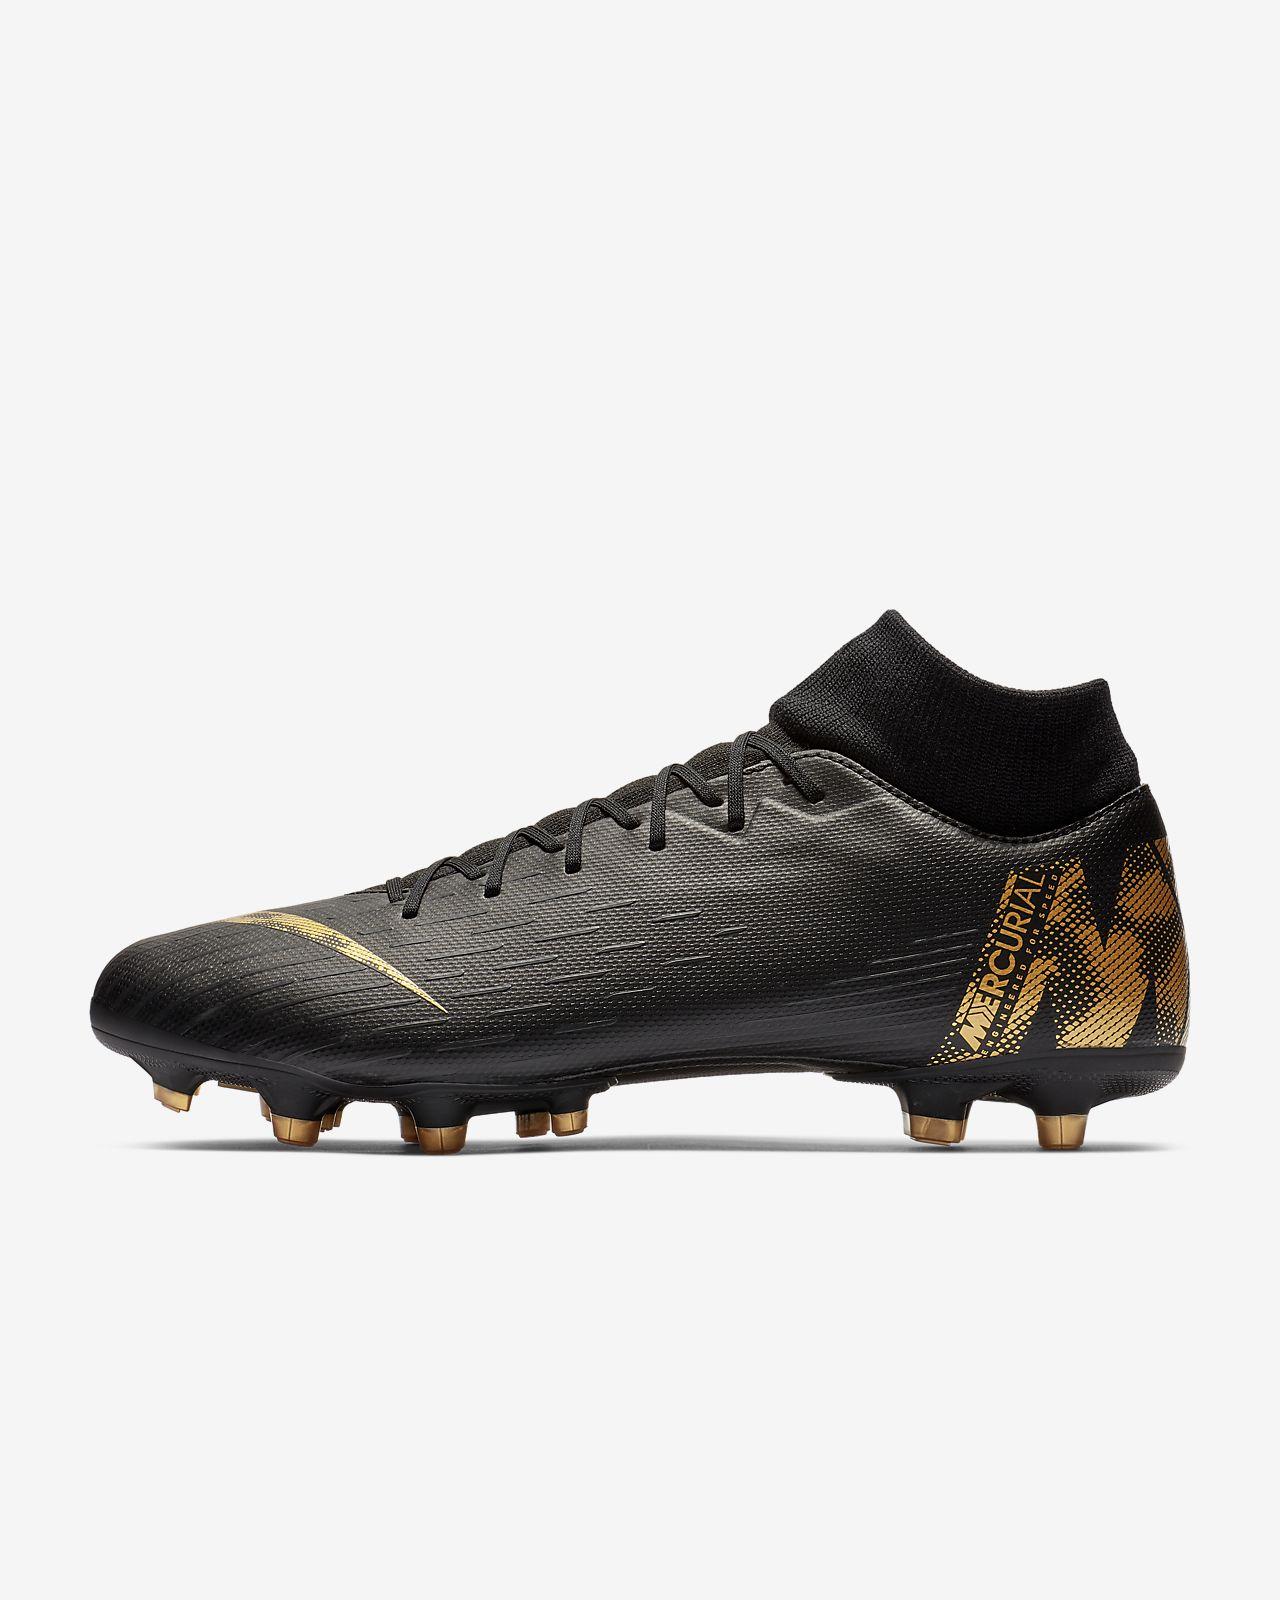 Chaussure de football multi-terrains à crampons Nike Mercurial Superfly 6 Academy MG